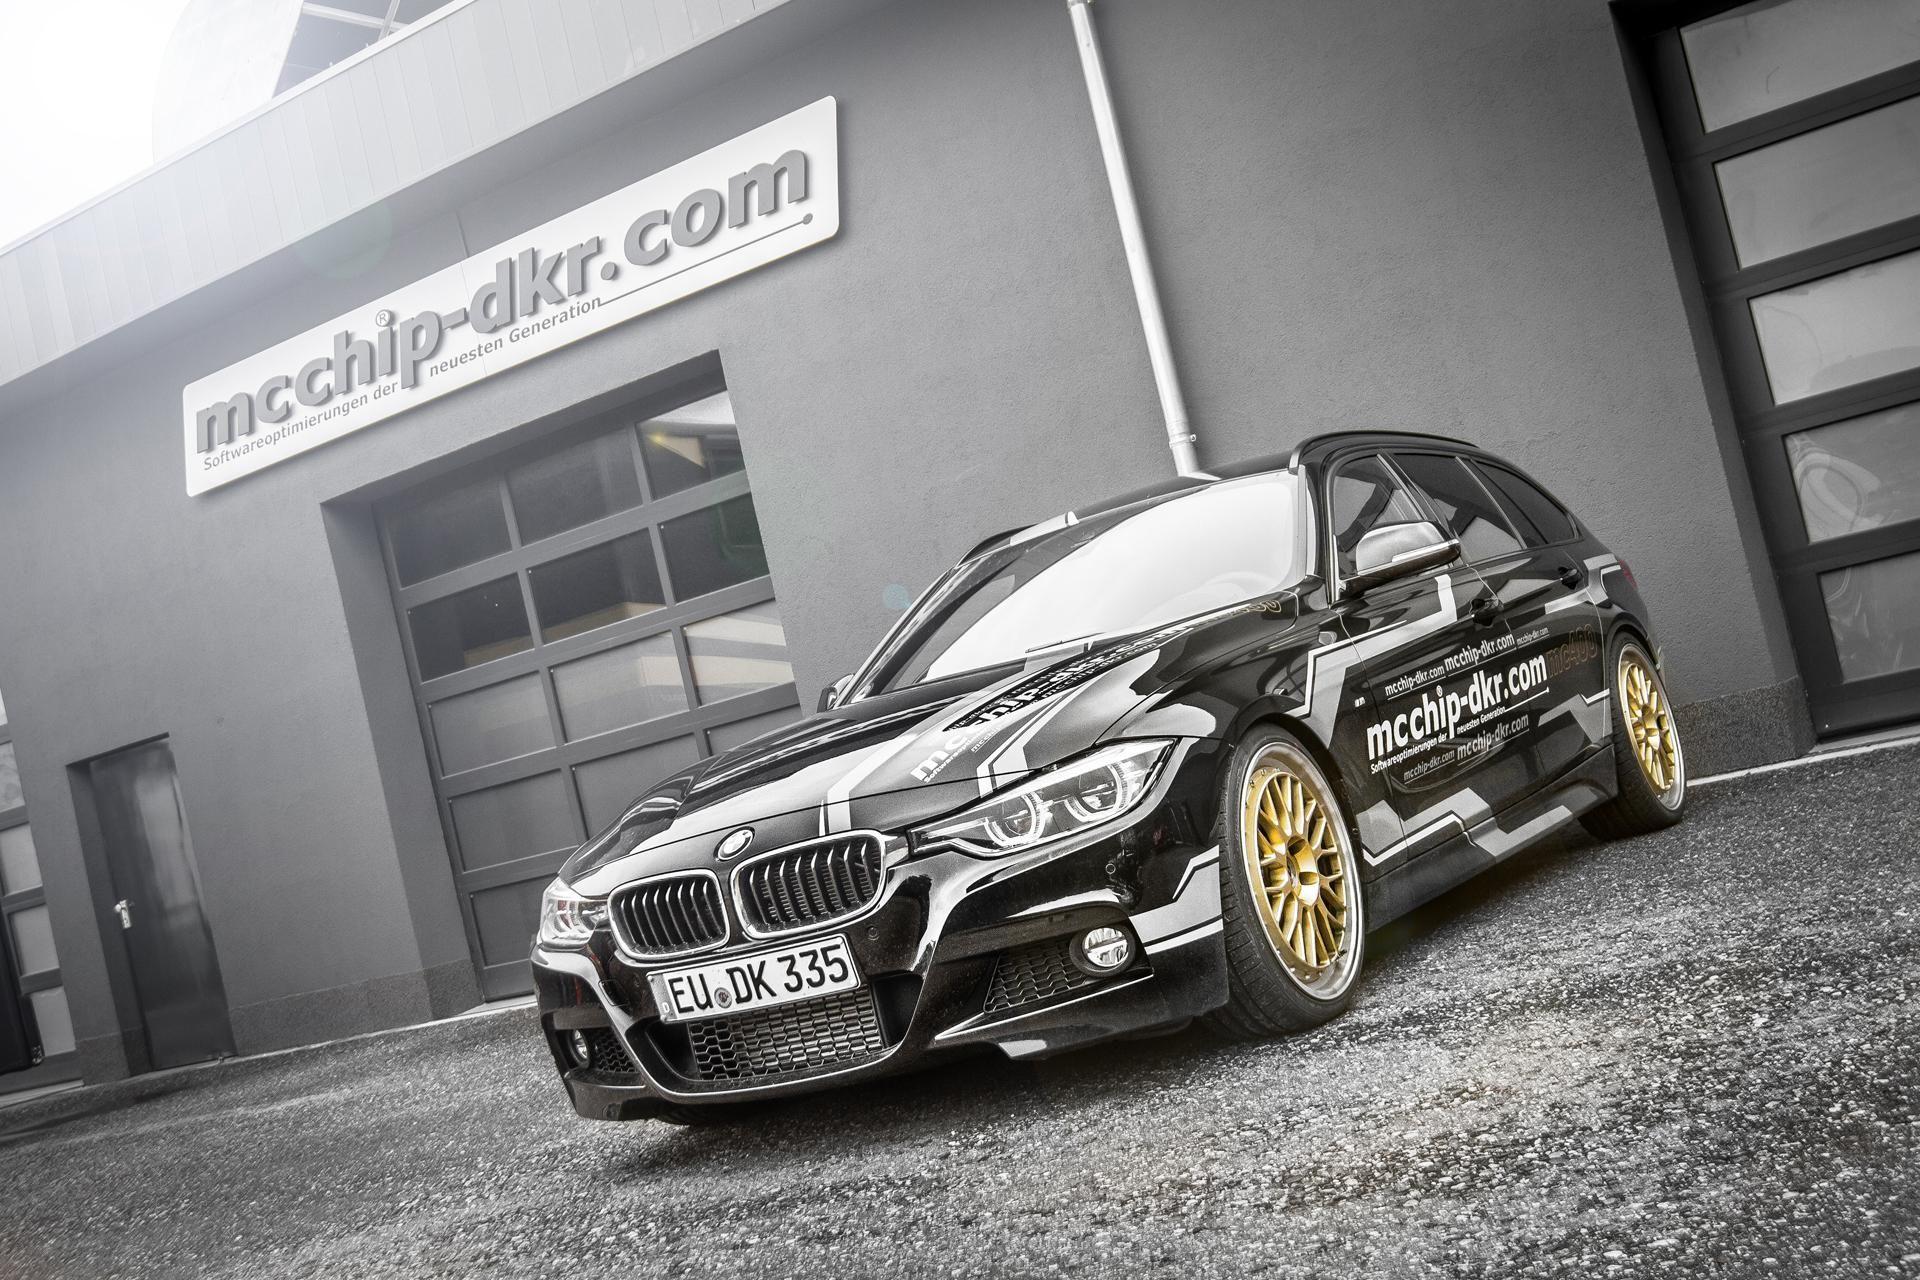 BMW 335d F31 3 0d mc400